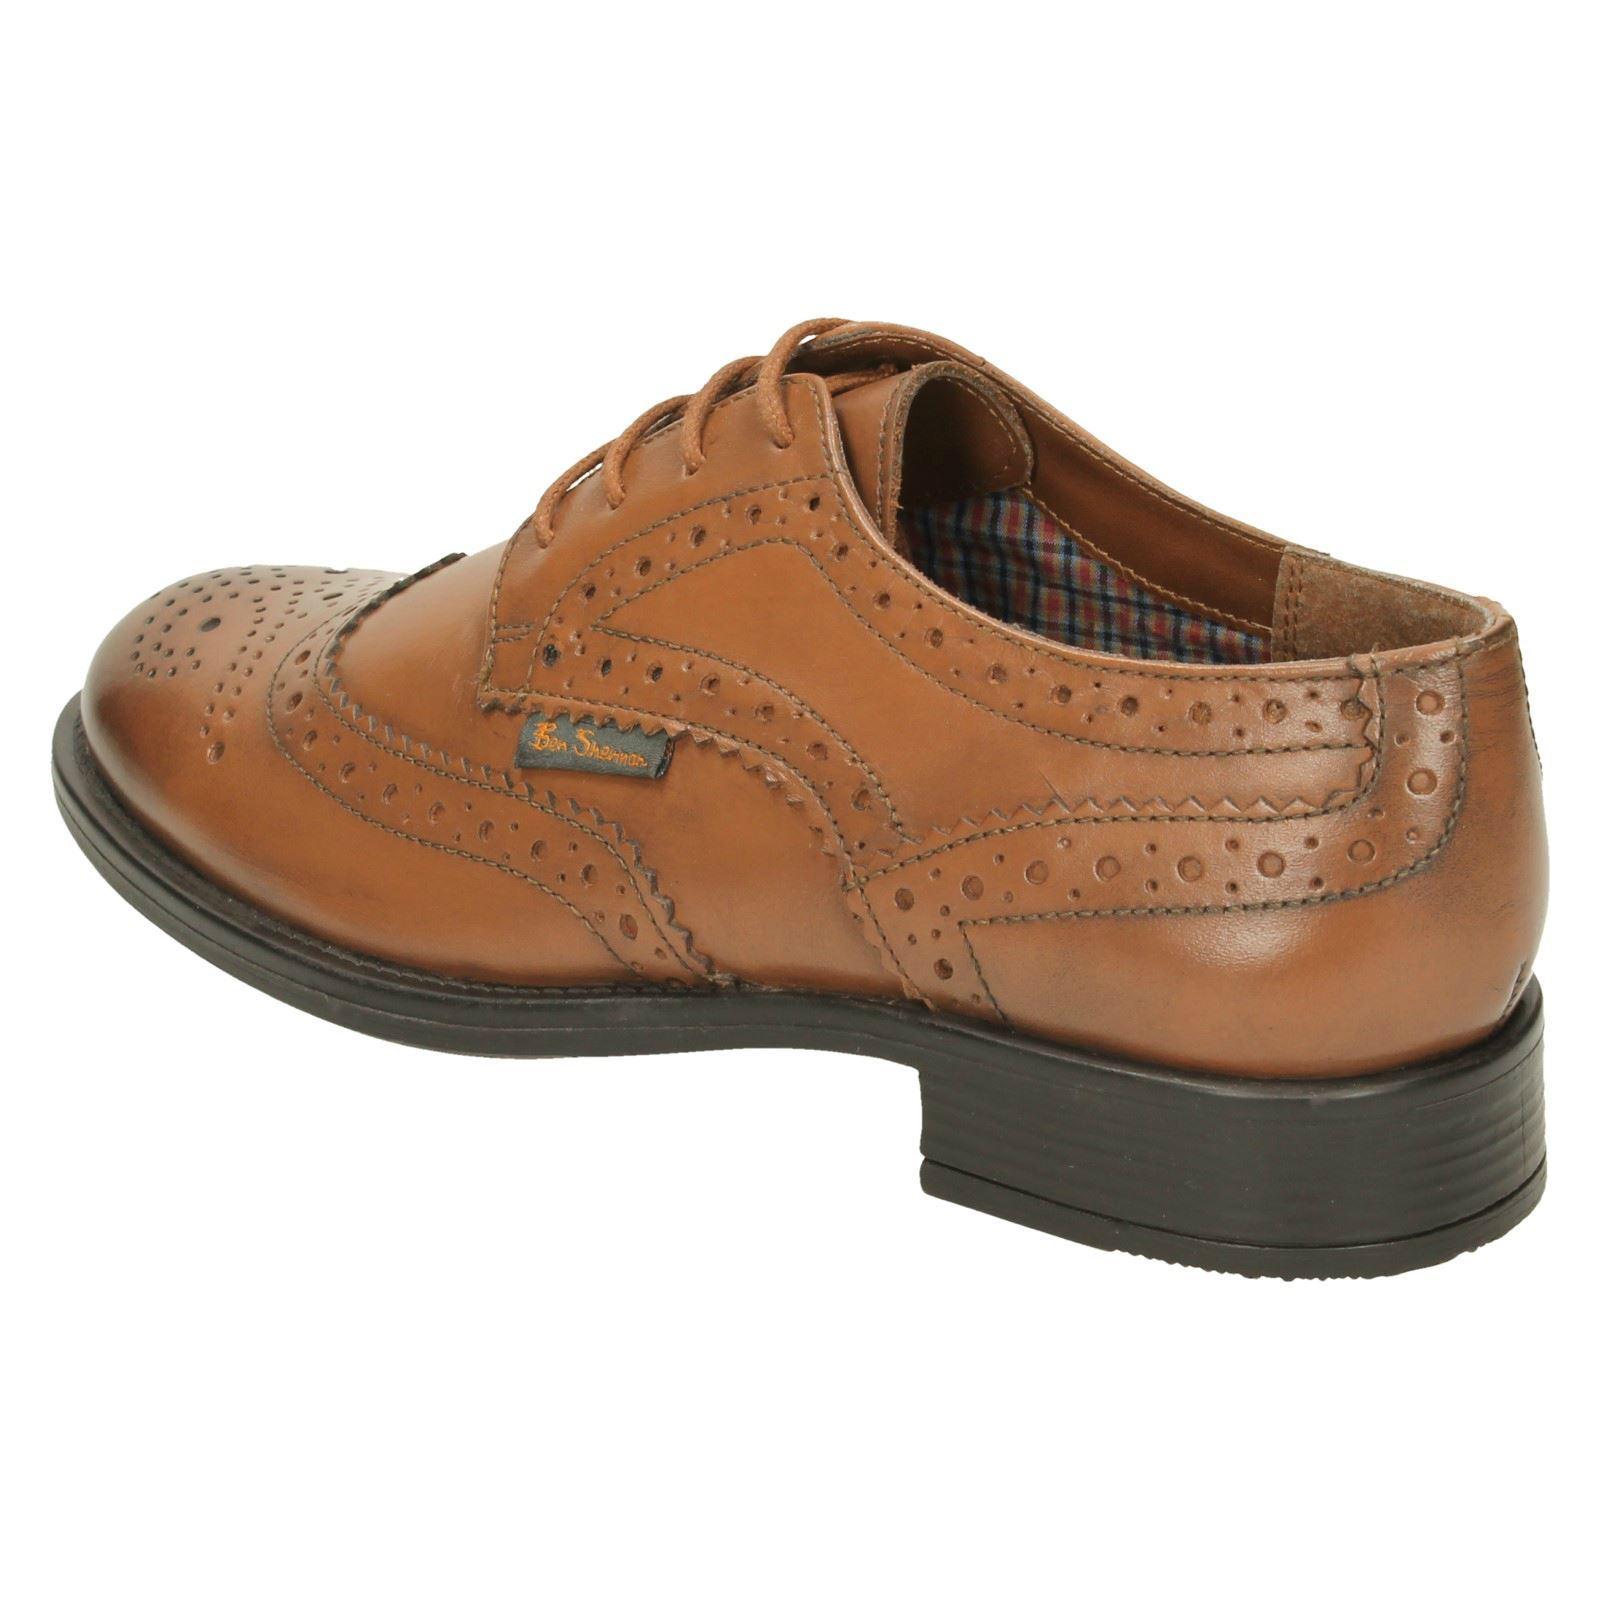 Uomo Ben Simpson Sherman Lace Up Brogue Schuhes Label Simpson Ben  N 1f9a87